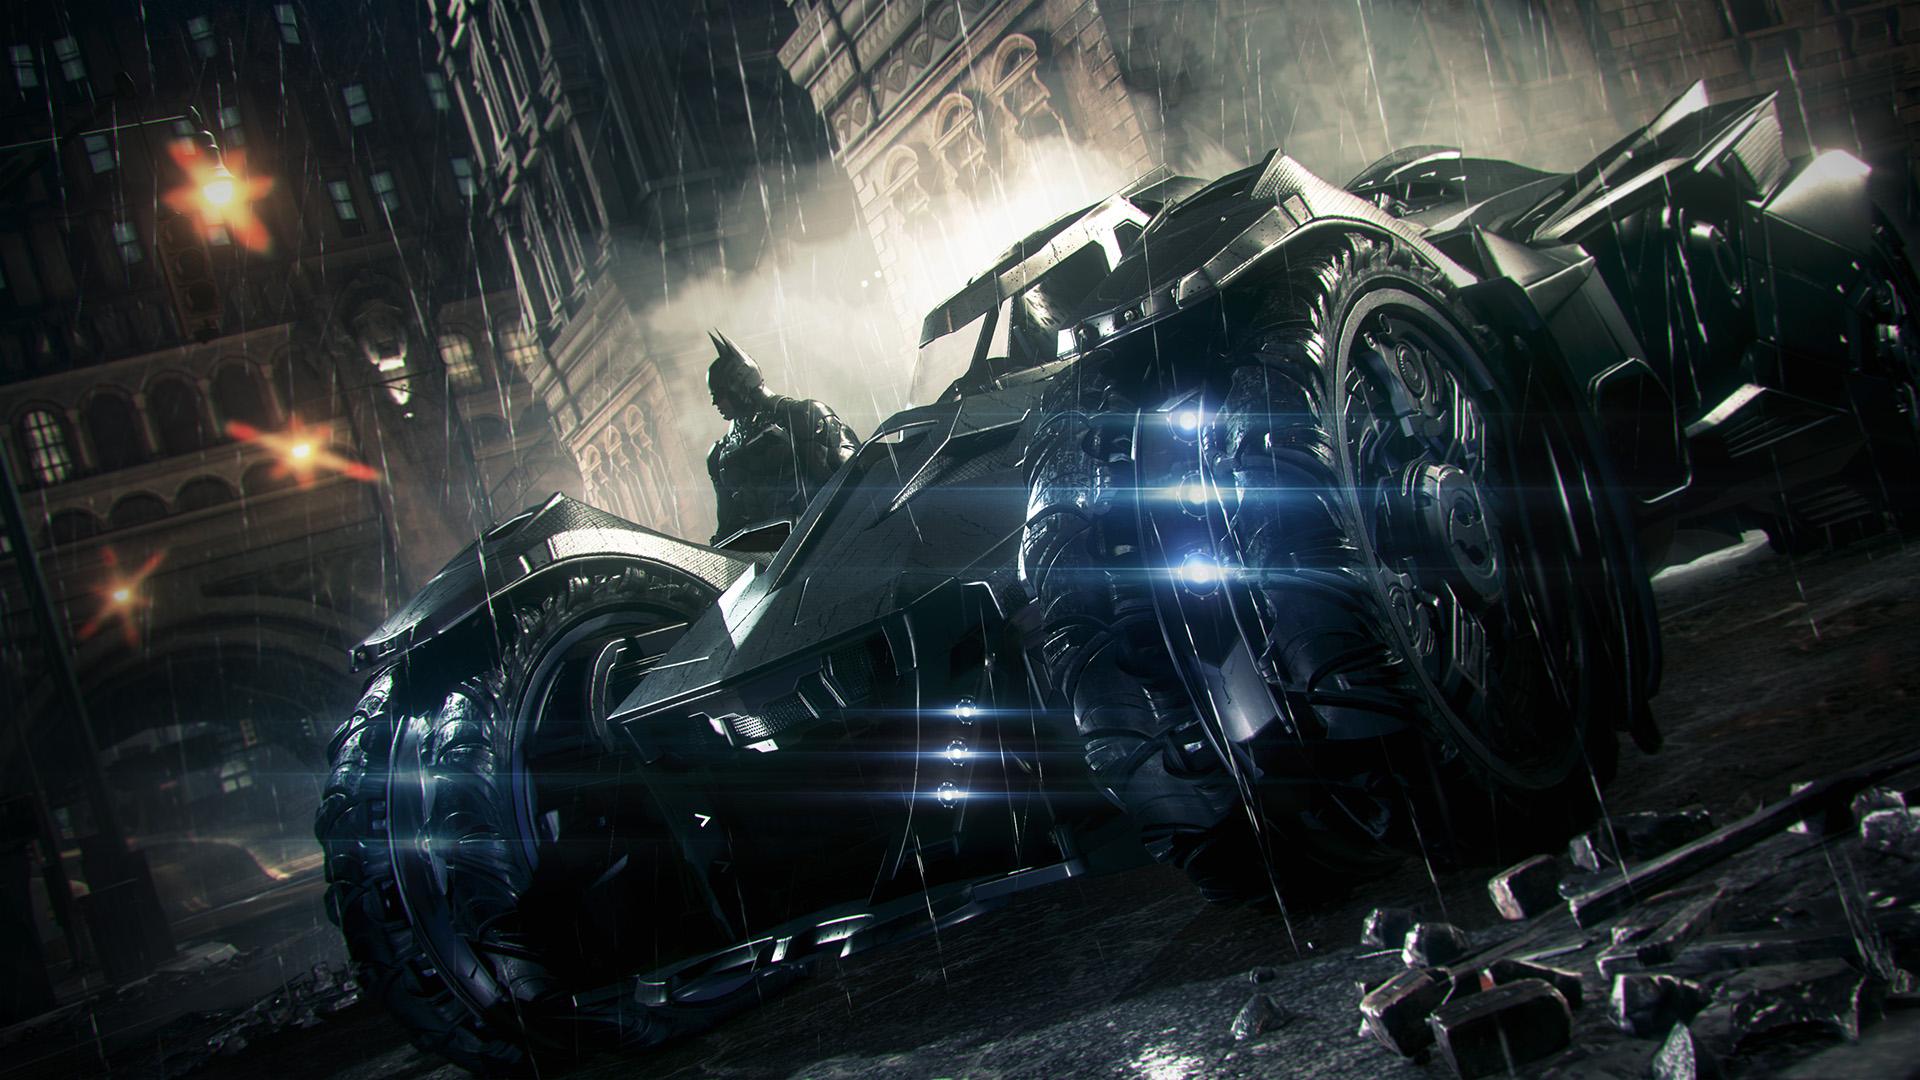 How To Get The Pre Order Batman Arkham Knight Extras Return Asylum Reg 3 Ps4